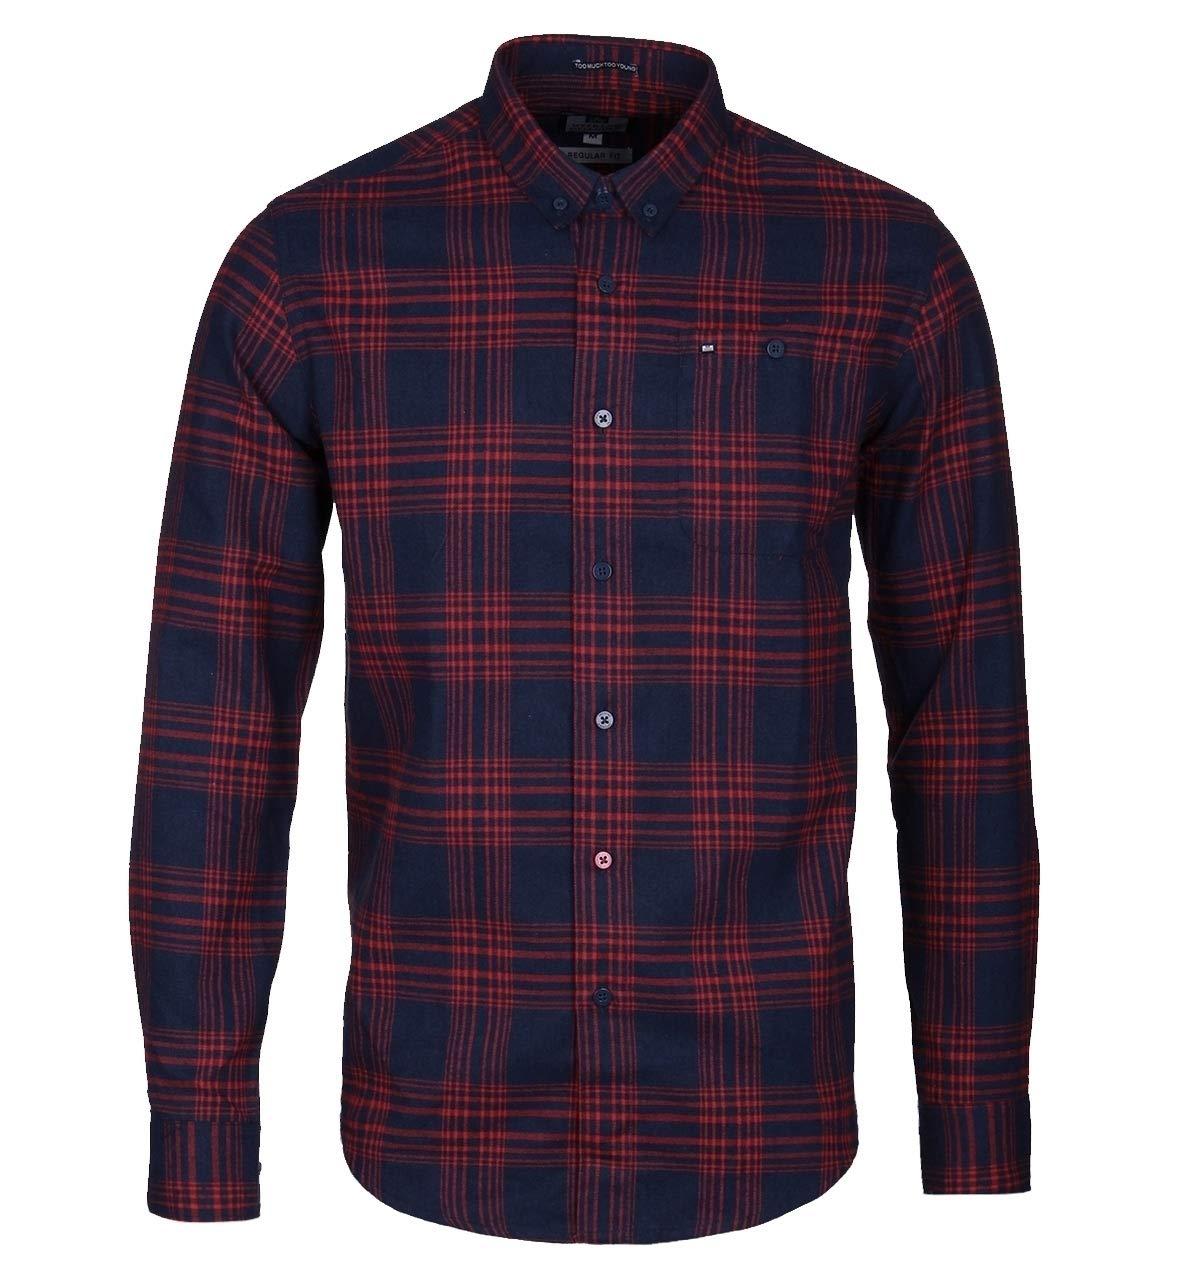 de moda Weekend Offender Navy  Red O'Connel Shirt - Extra Extra Extra Small  calidad garantizada